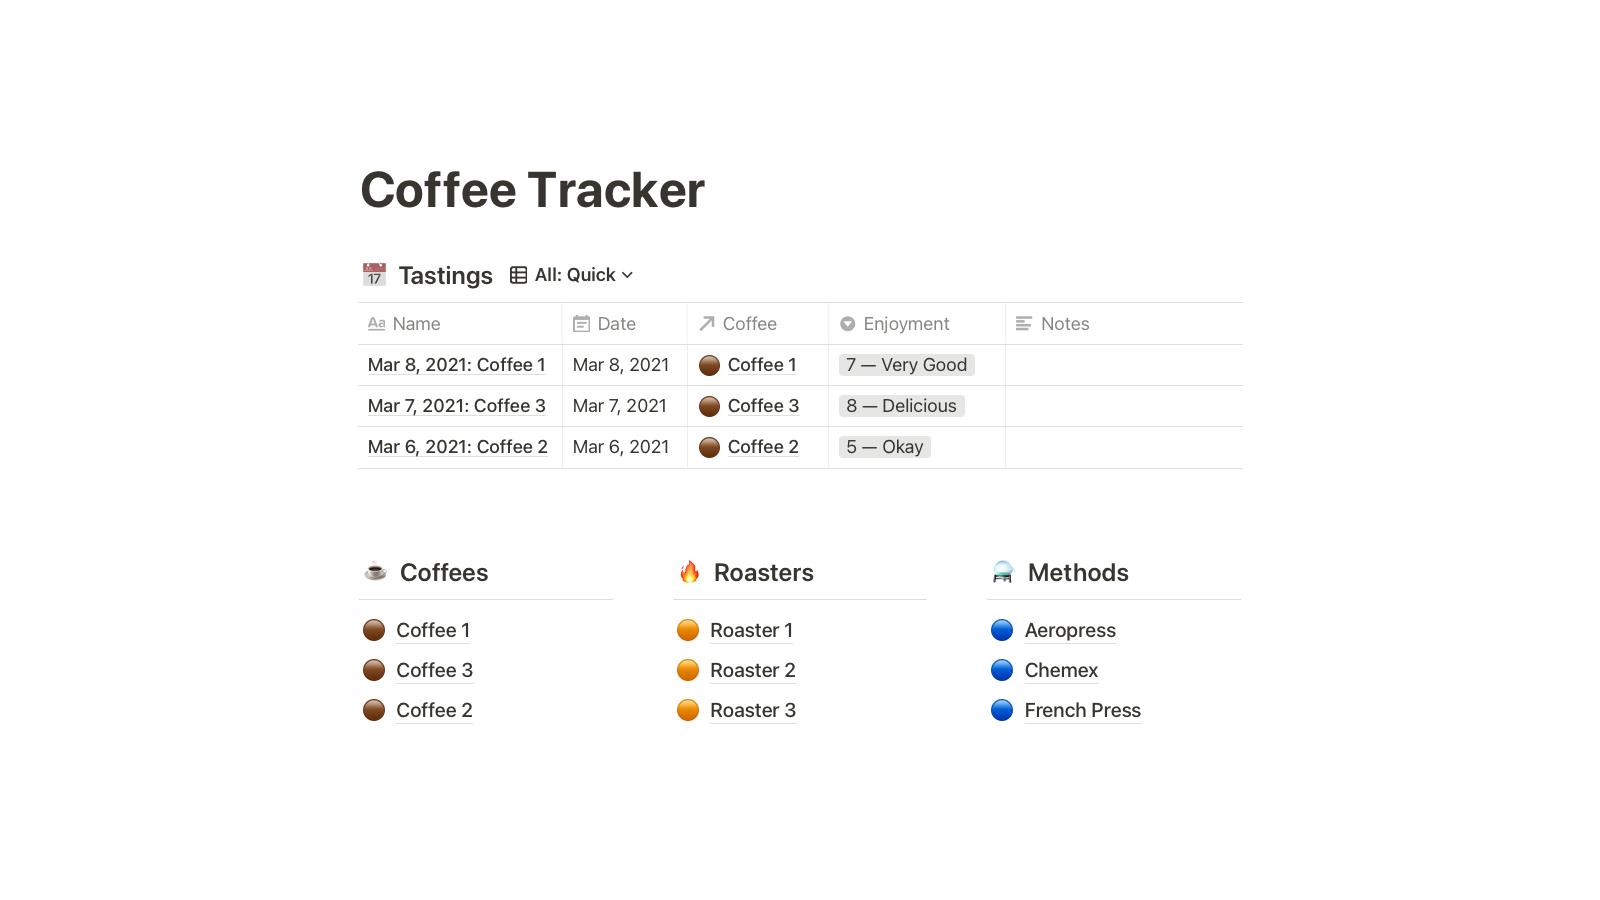 Coffee Tracker